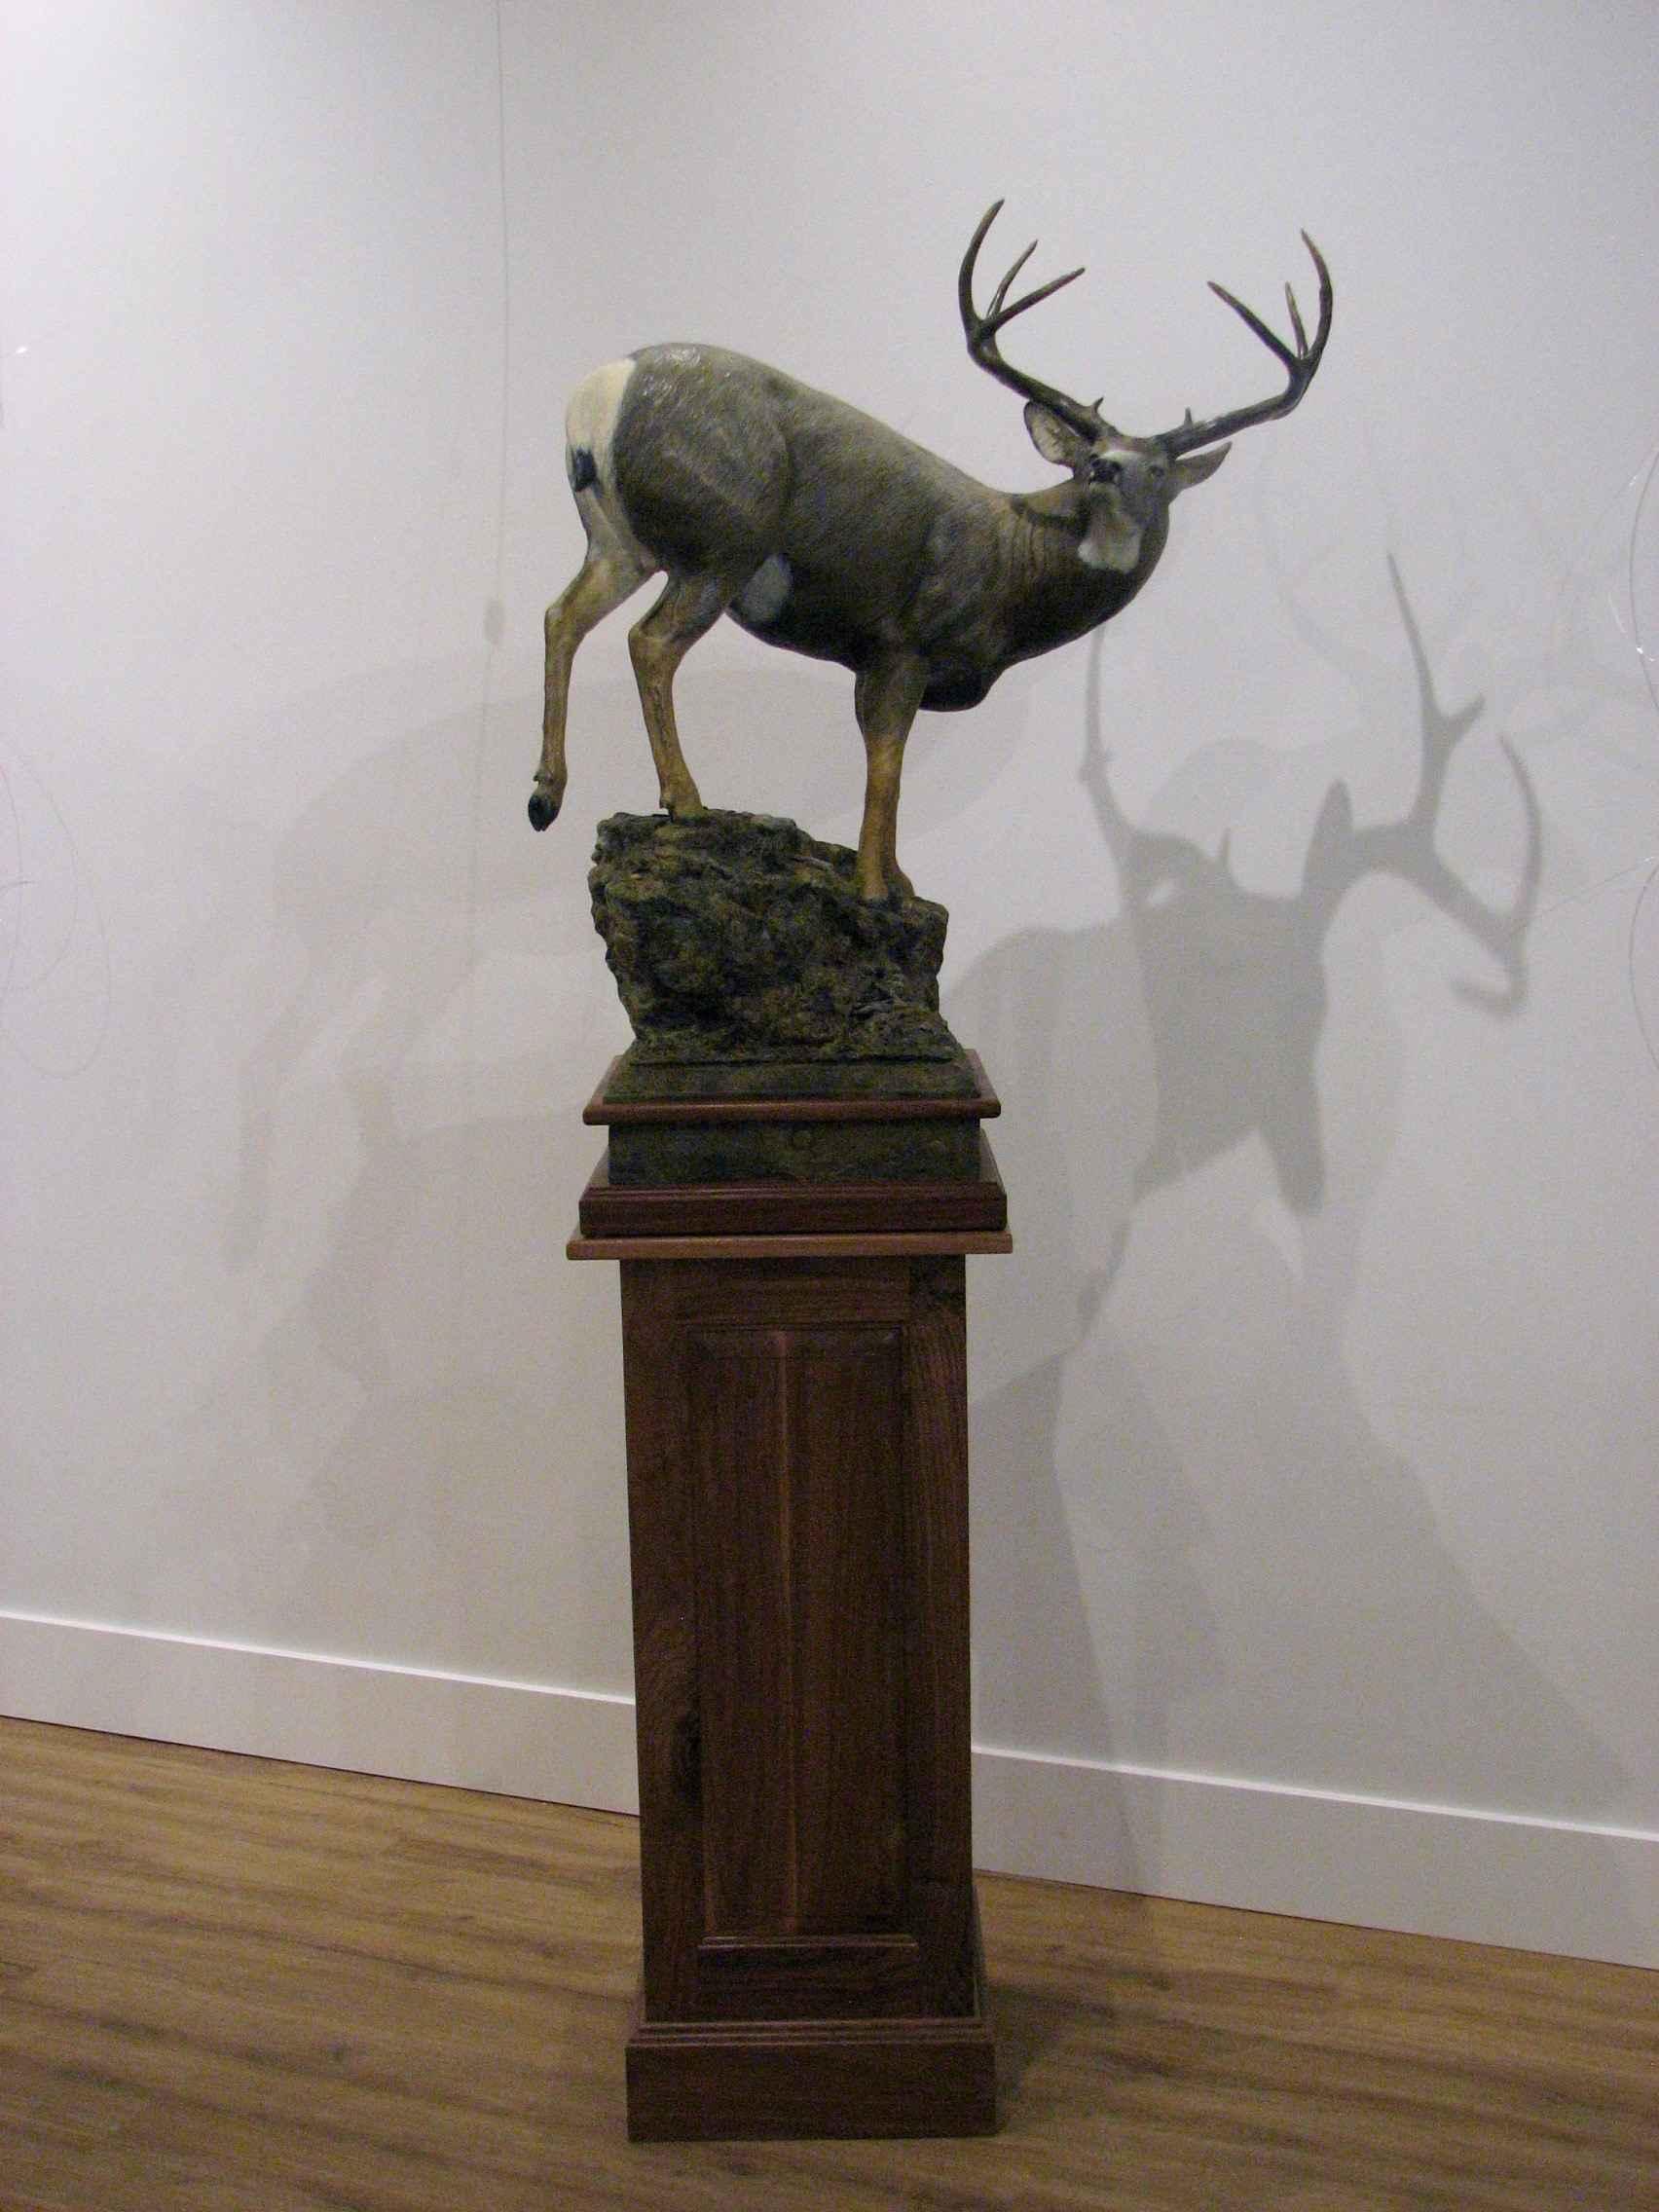 Ridge Runner by  Sam Terakedis - Masterpiece Online